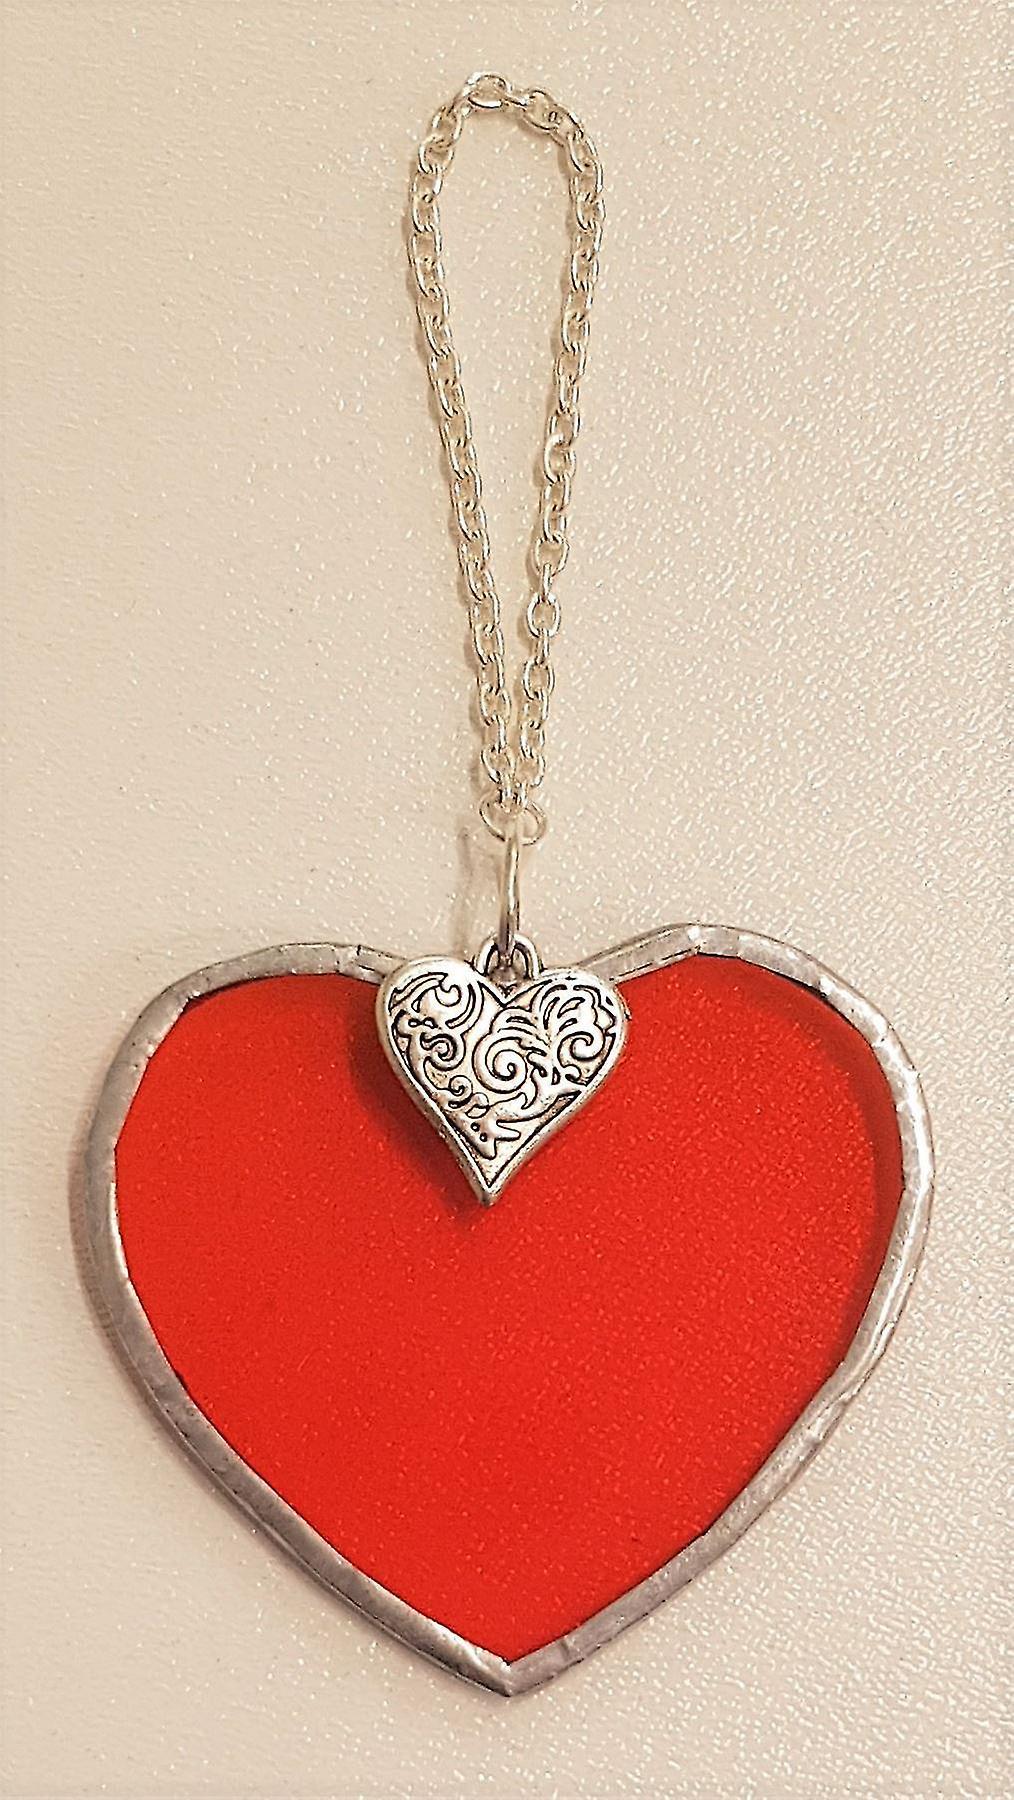 Simmerdim Design Small Orange Heart Heart